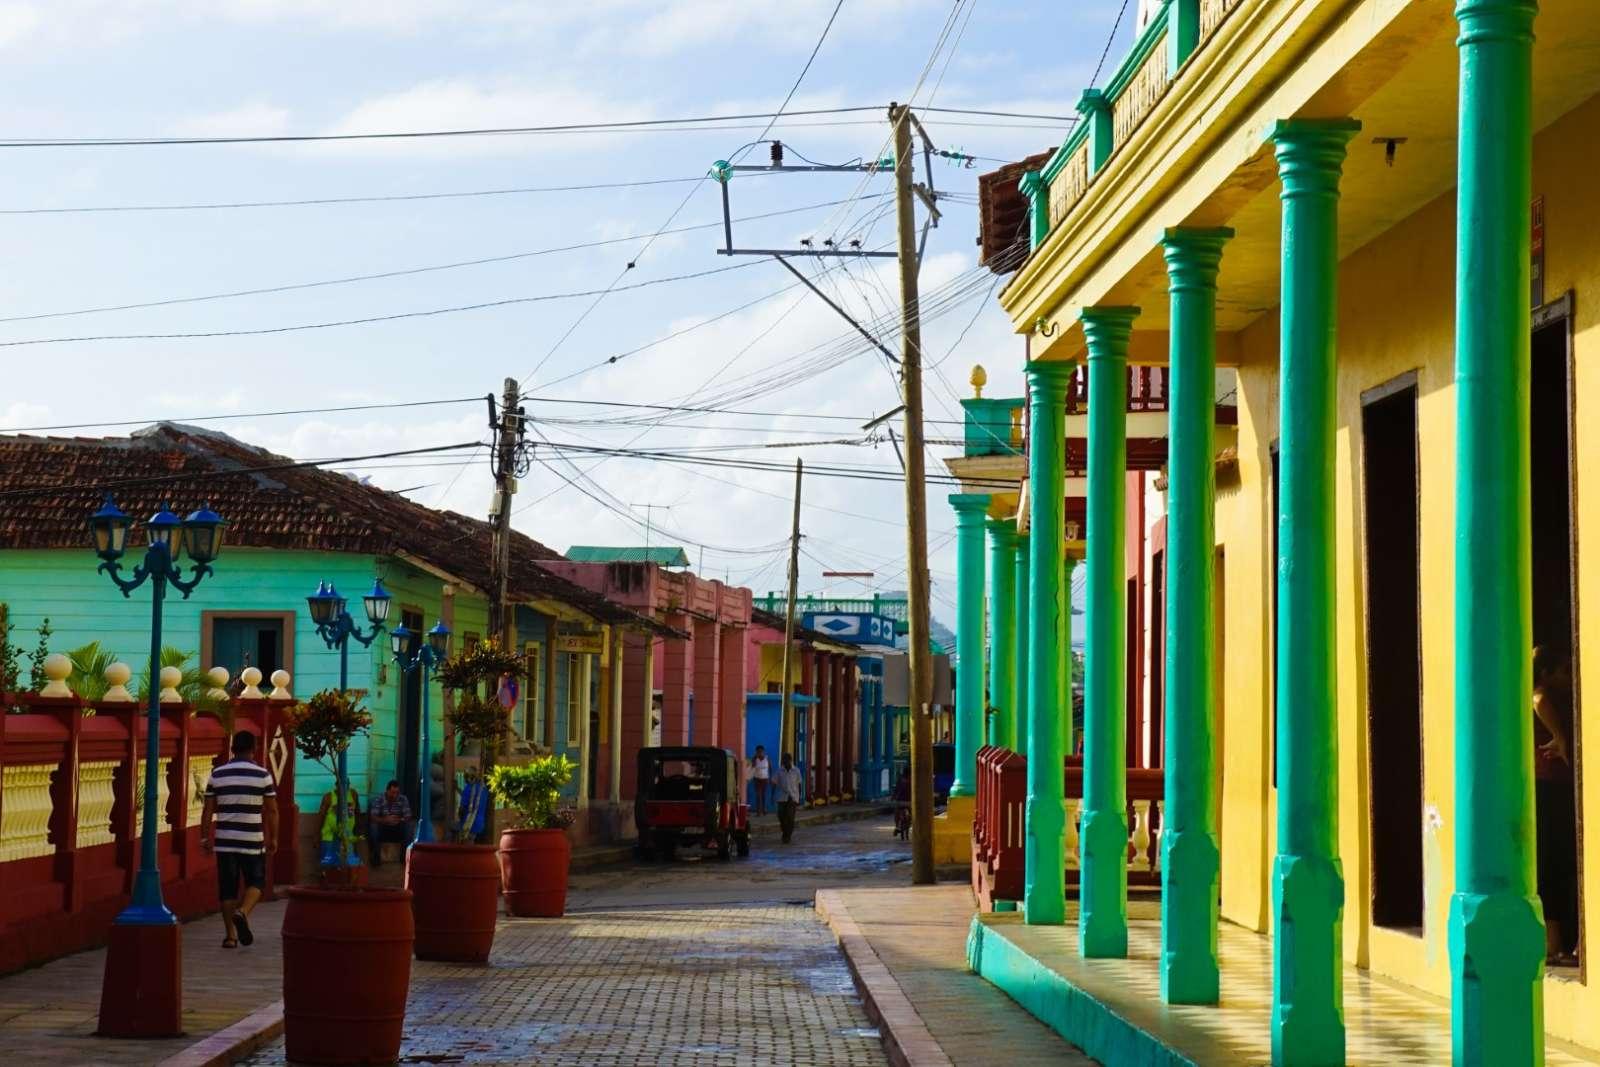 Street scene in Baracoa Cuba